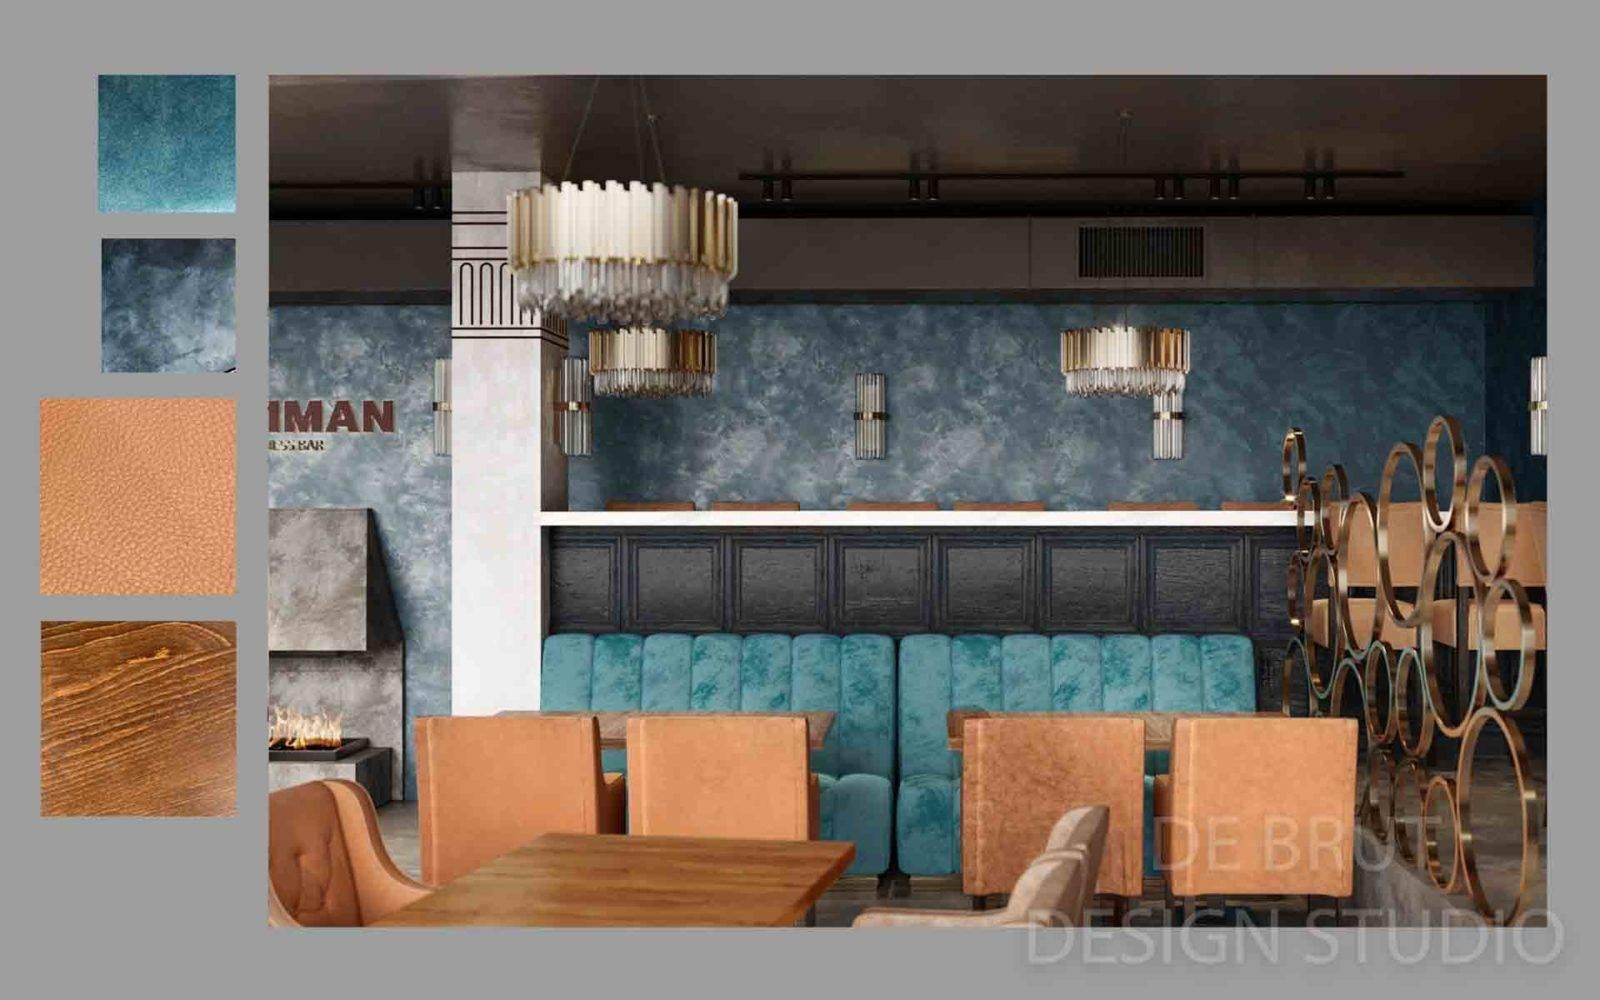 design interieru praha alex brut studio richman bussines bar 13 - Design interiéru restaurace Richman